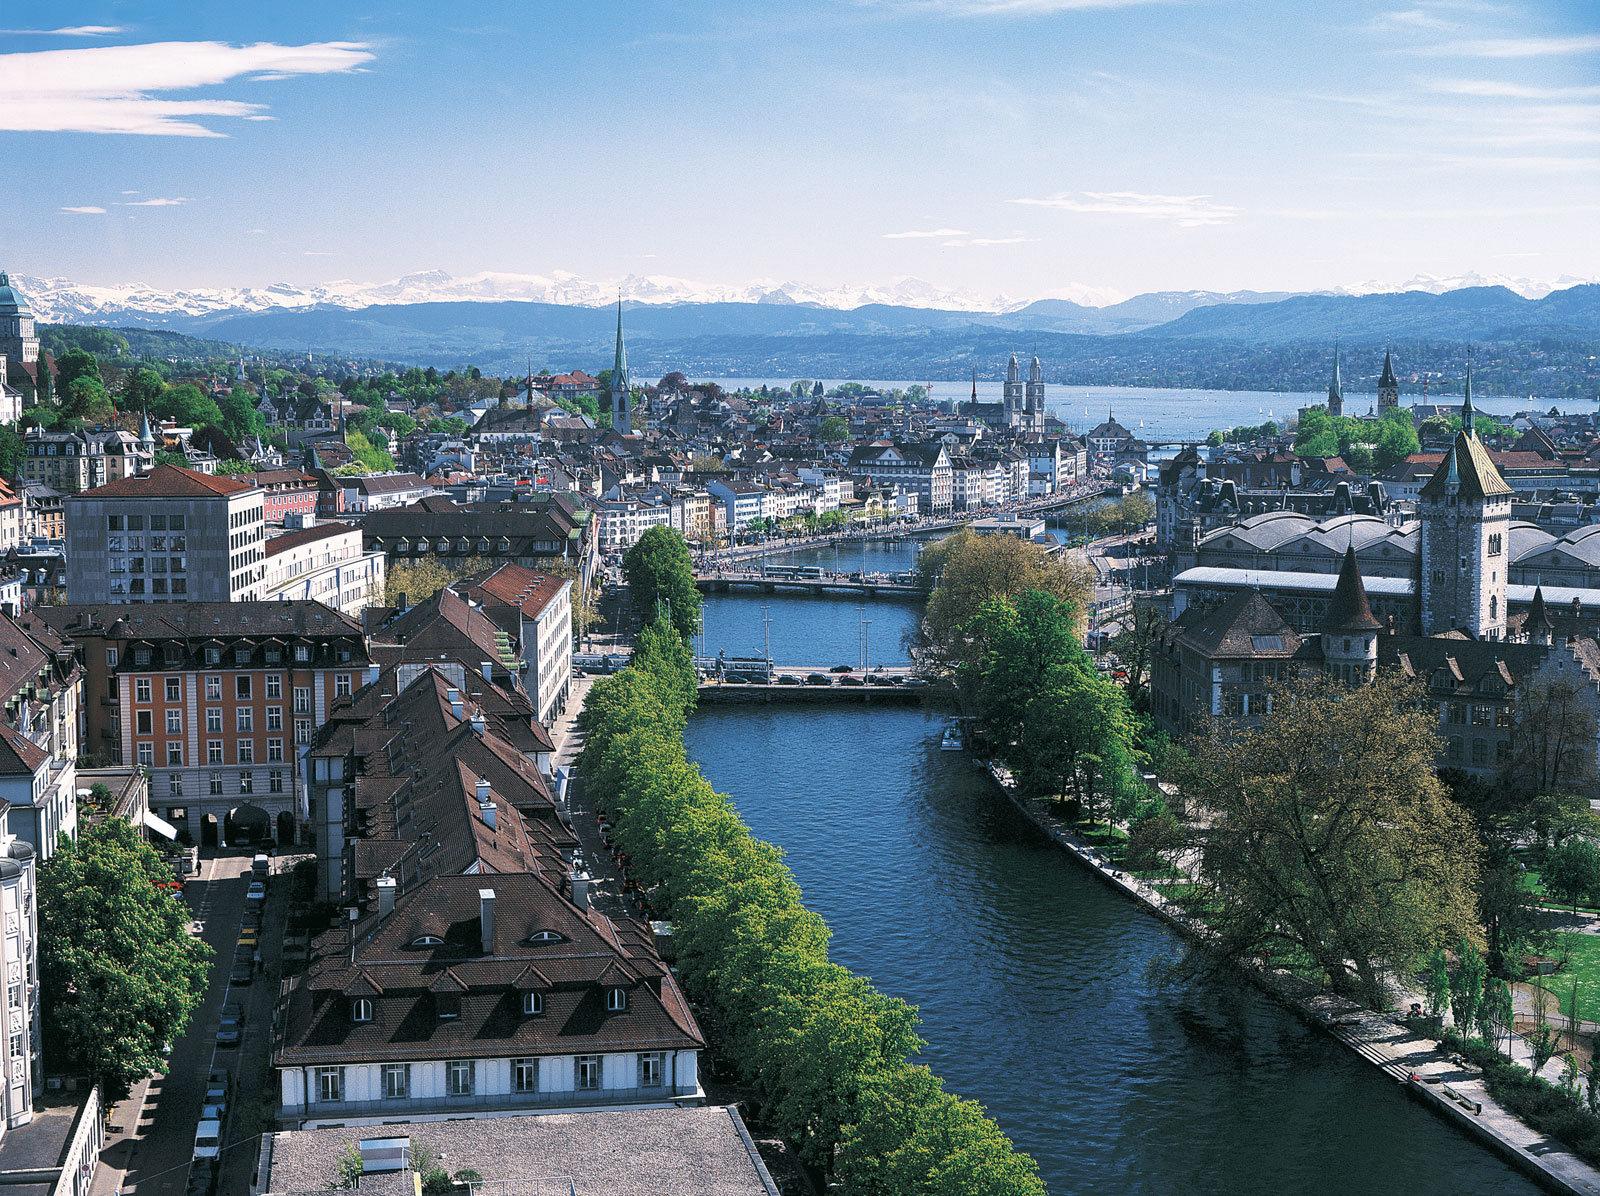 лучший аэропорт для пересадки - Цюрих